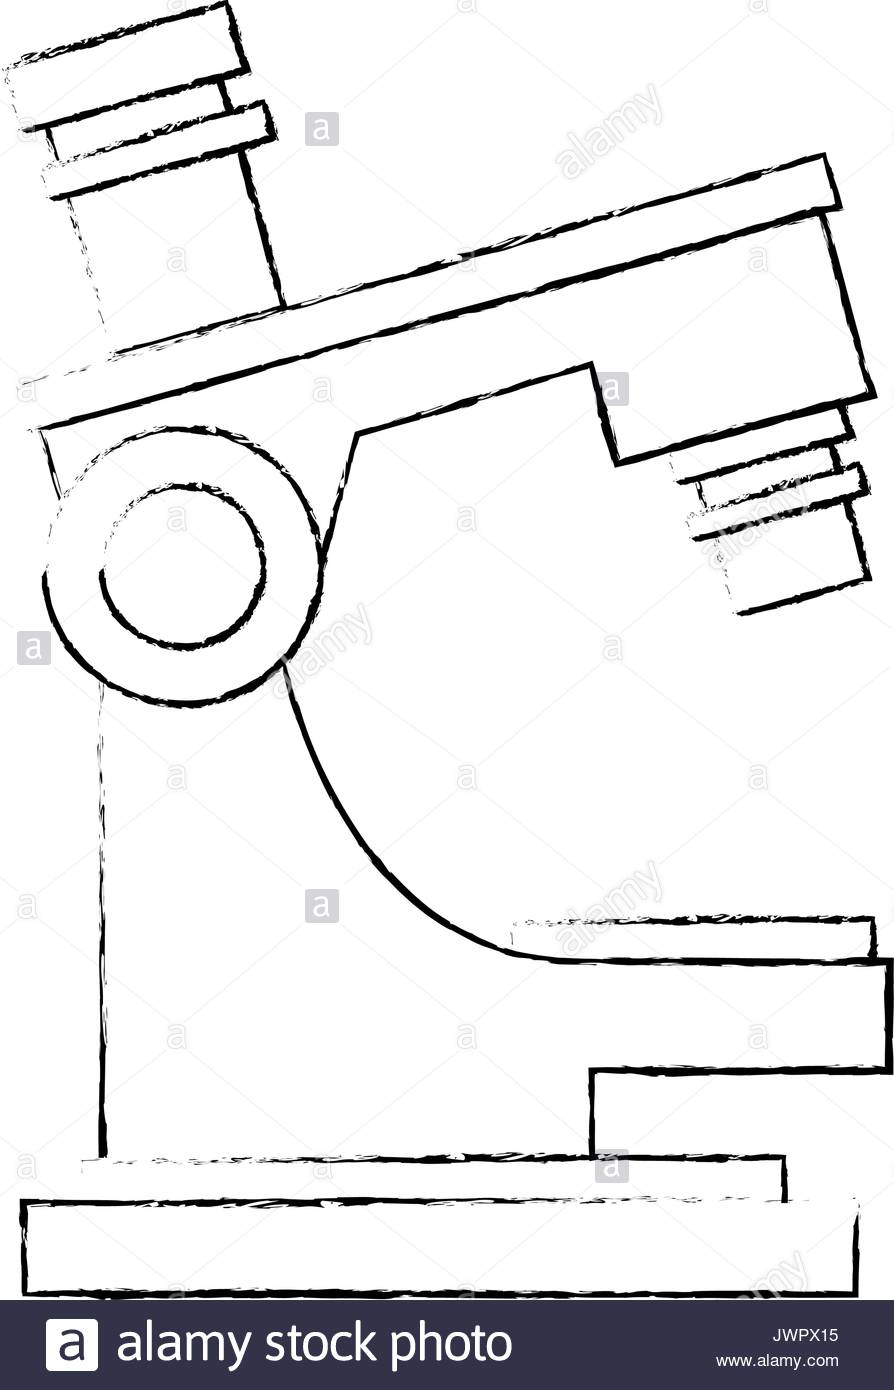 894x1390 Laboratory Microscope Sketch Stock Photos Amp Laboratory Microscope